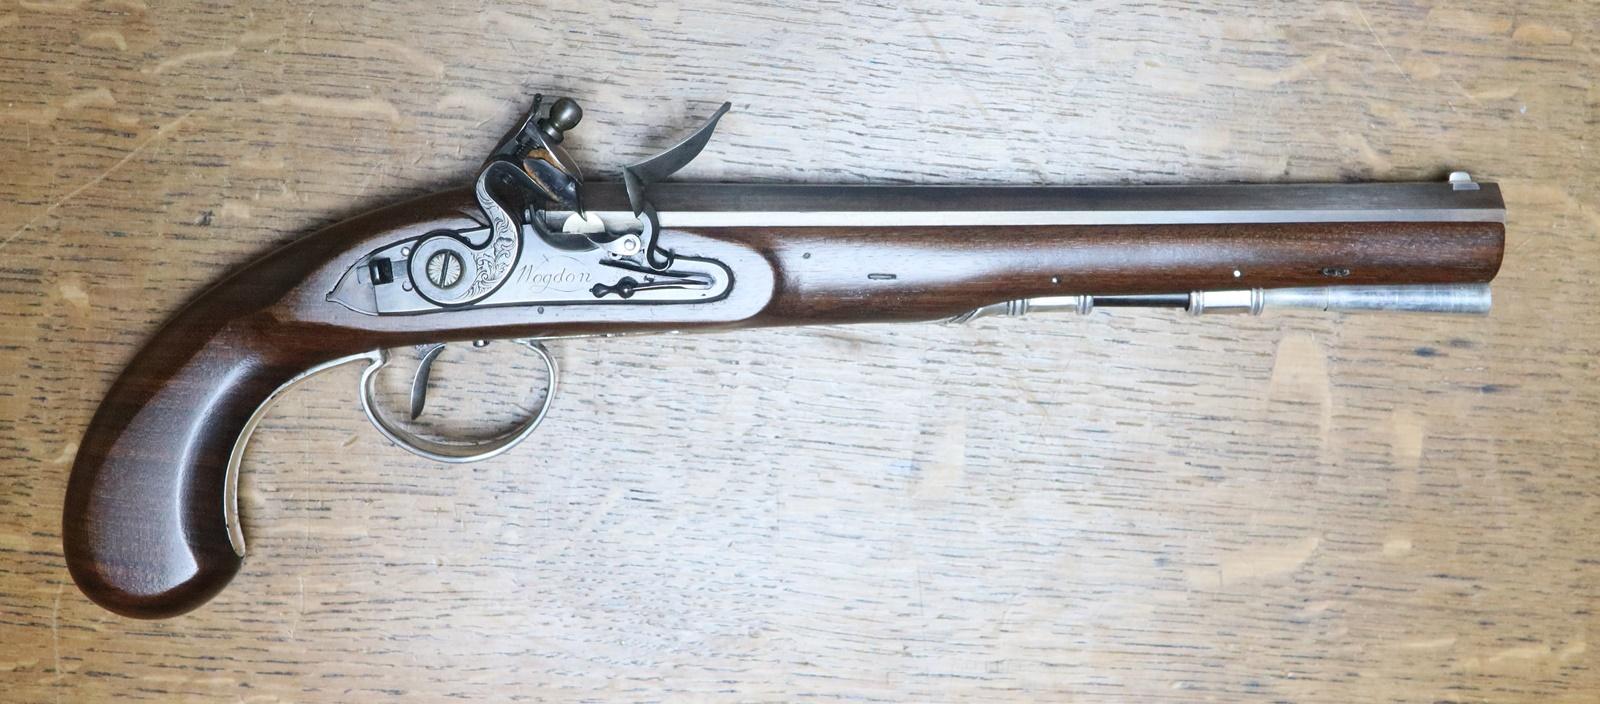 Wogdon duelling pistol reconstruction